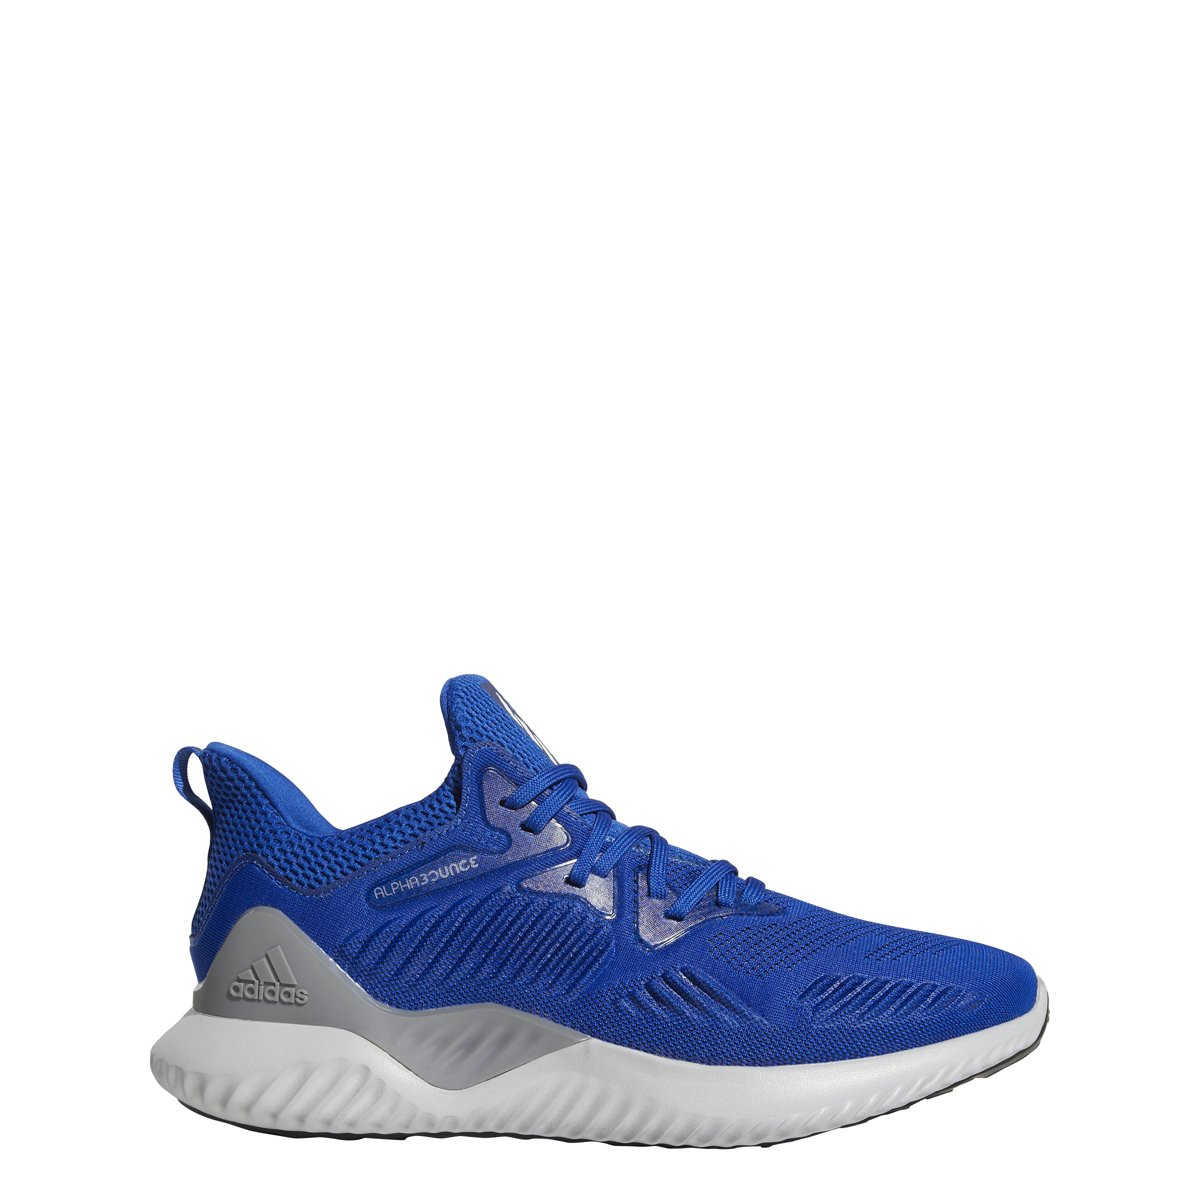 more photos 59a7e 6548b Amazon.com  adidas Mens Alphabounce Beyond Team Running Shoes  Road  Running